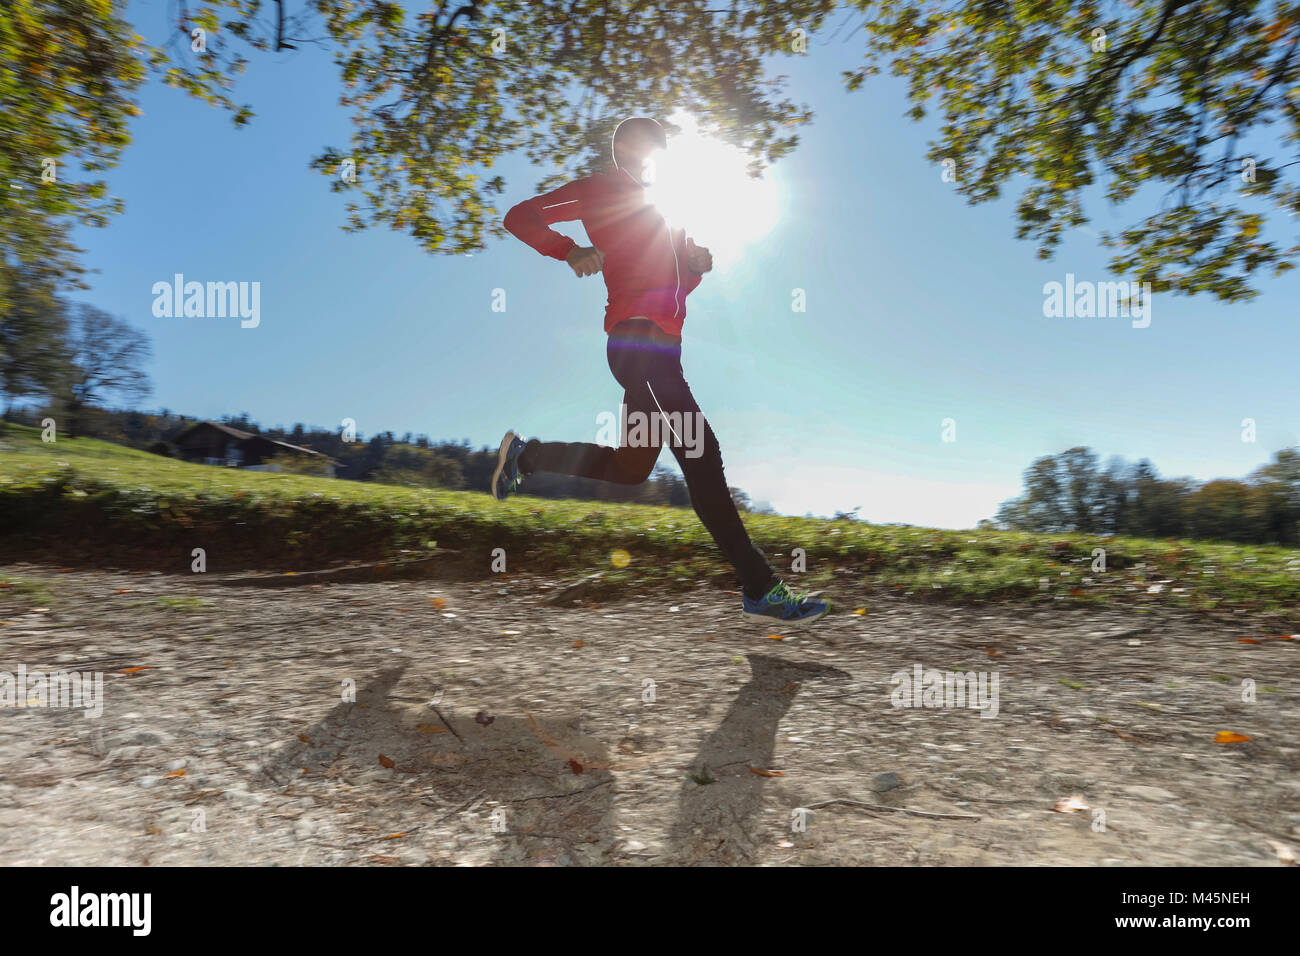 Mature male runner running down sunlit rural dirt track Stock Photo